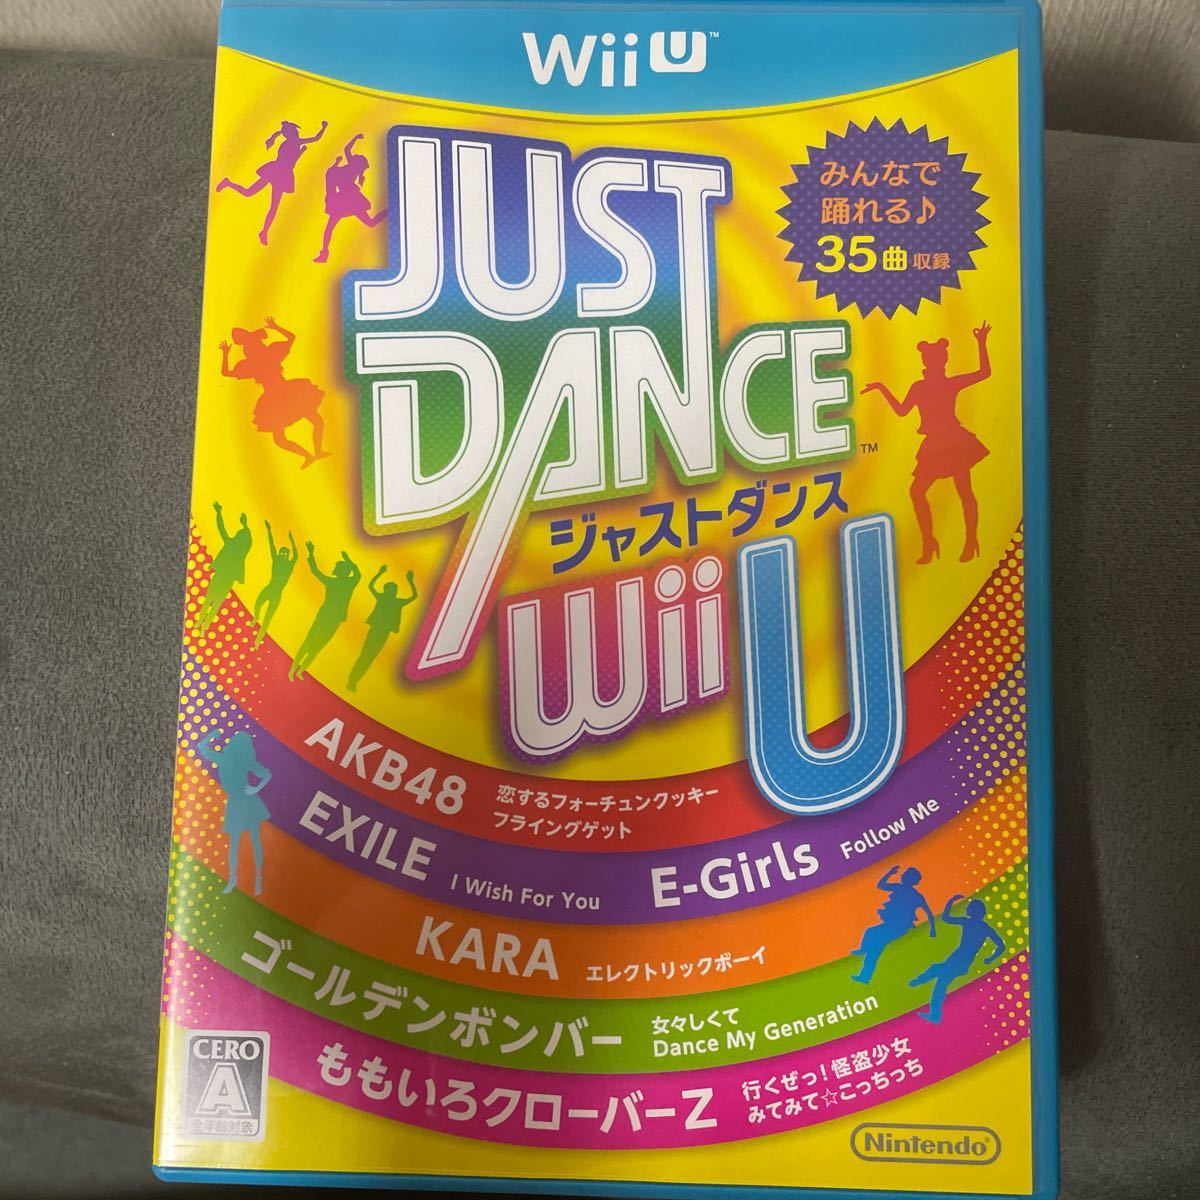 WiiU ジャストダンス JUST DANCE Wii U